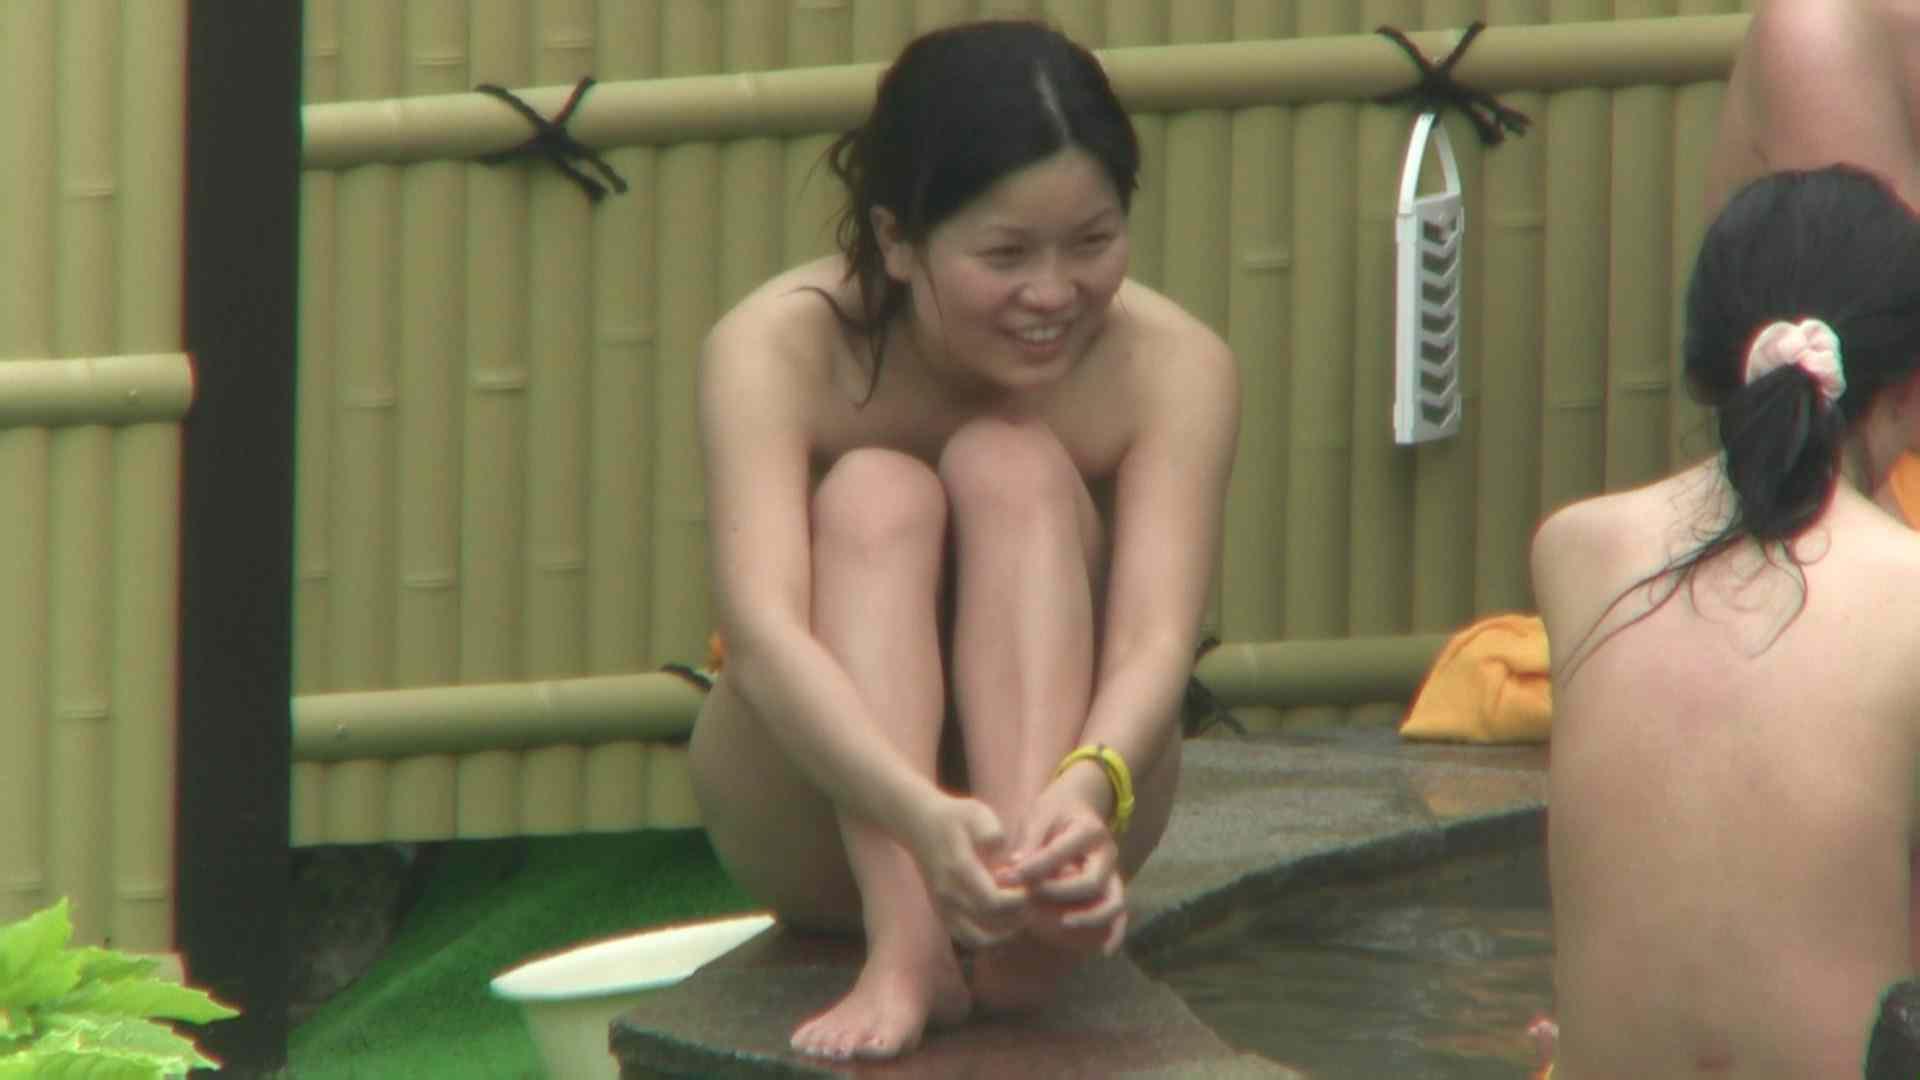 Aquaな露天風呂Vol.74【VIP限定】 綺麗なOLたち われめAV動画紹介 79枚 65